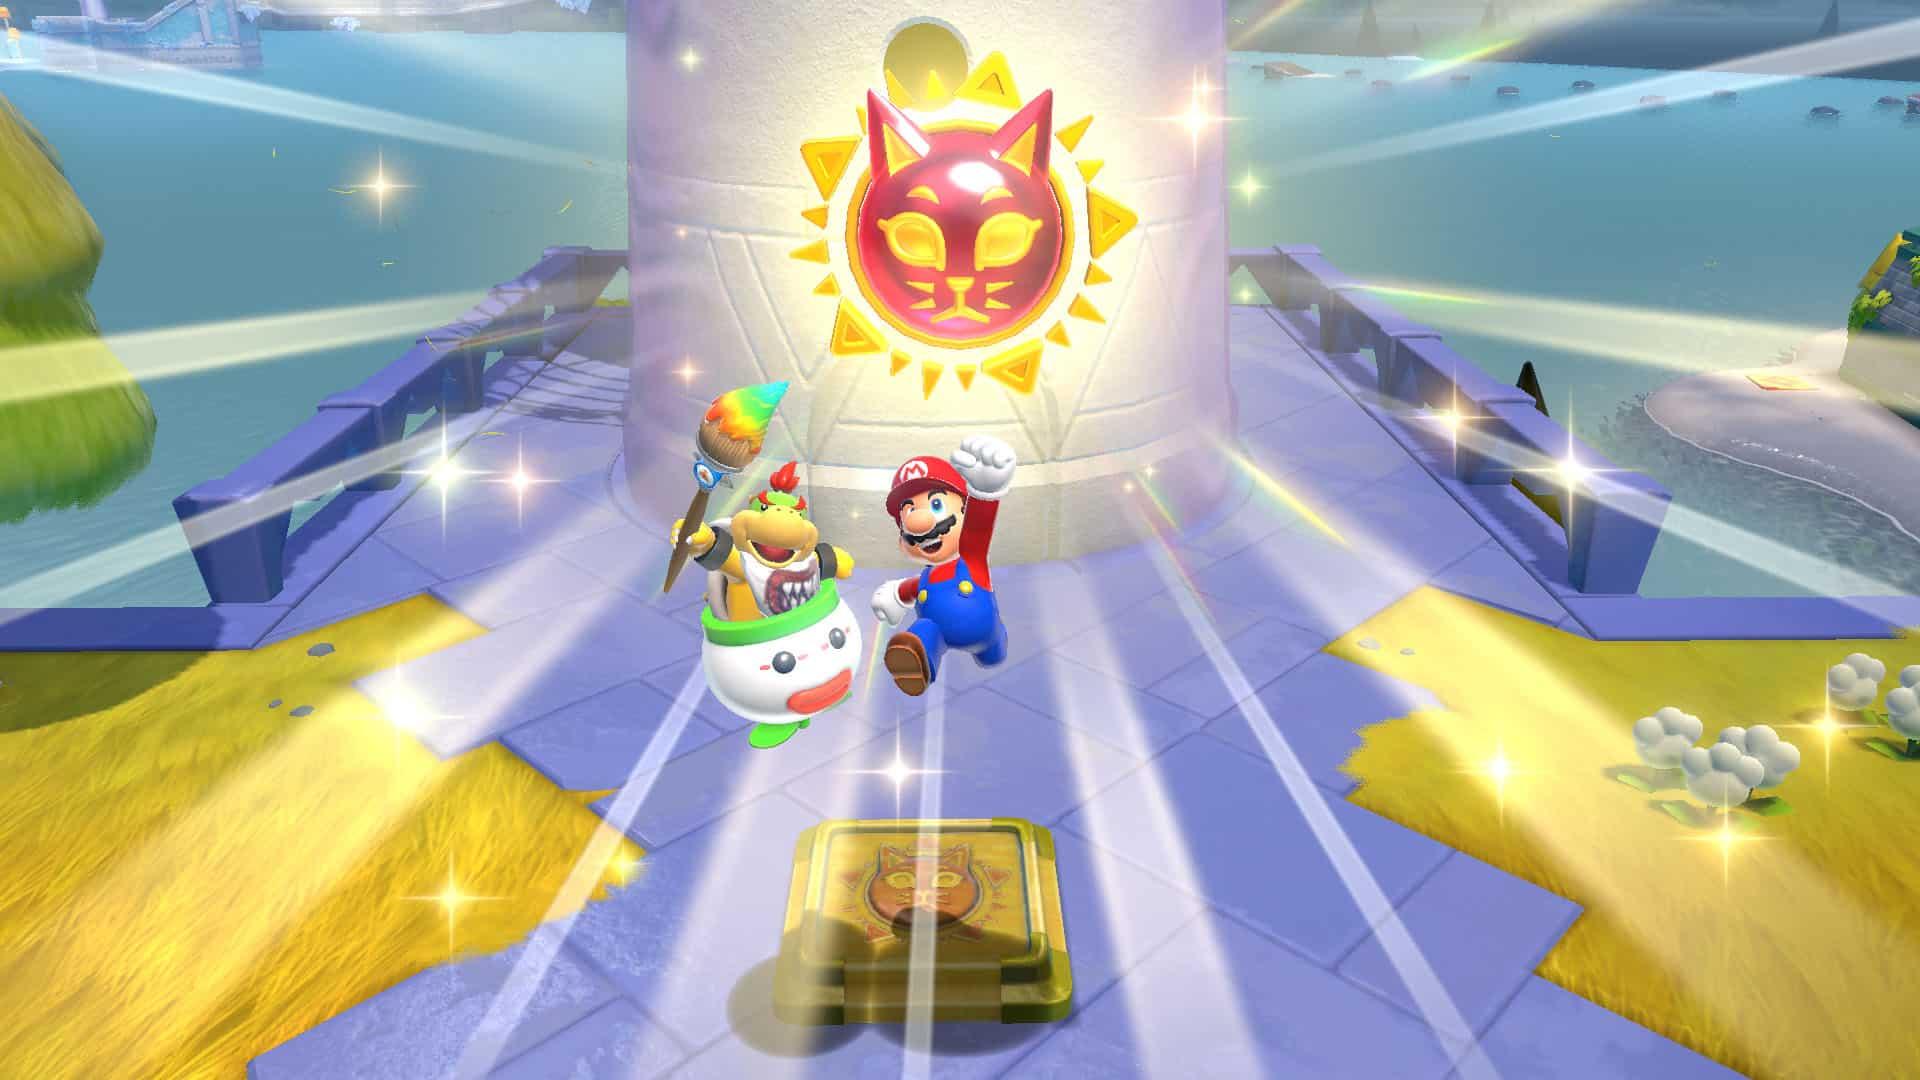 Cat Shine Nintendo fixes Super Mario Odyssey mistake failing with Super Mario 3D World + Bowser's Fury